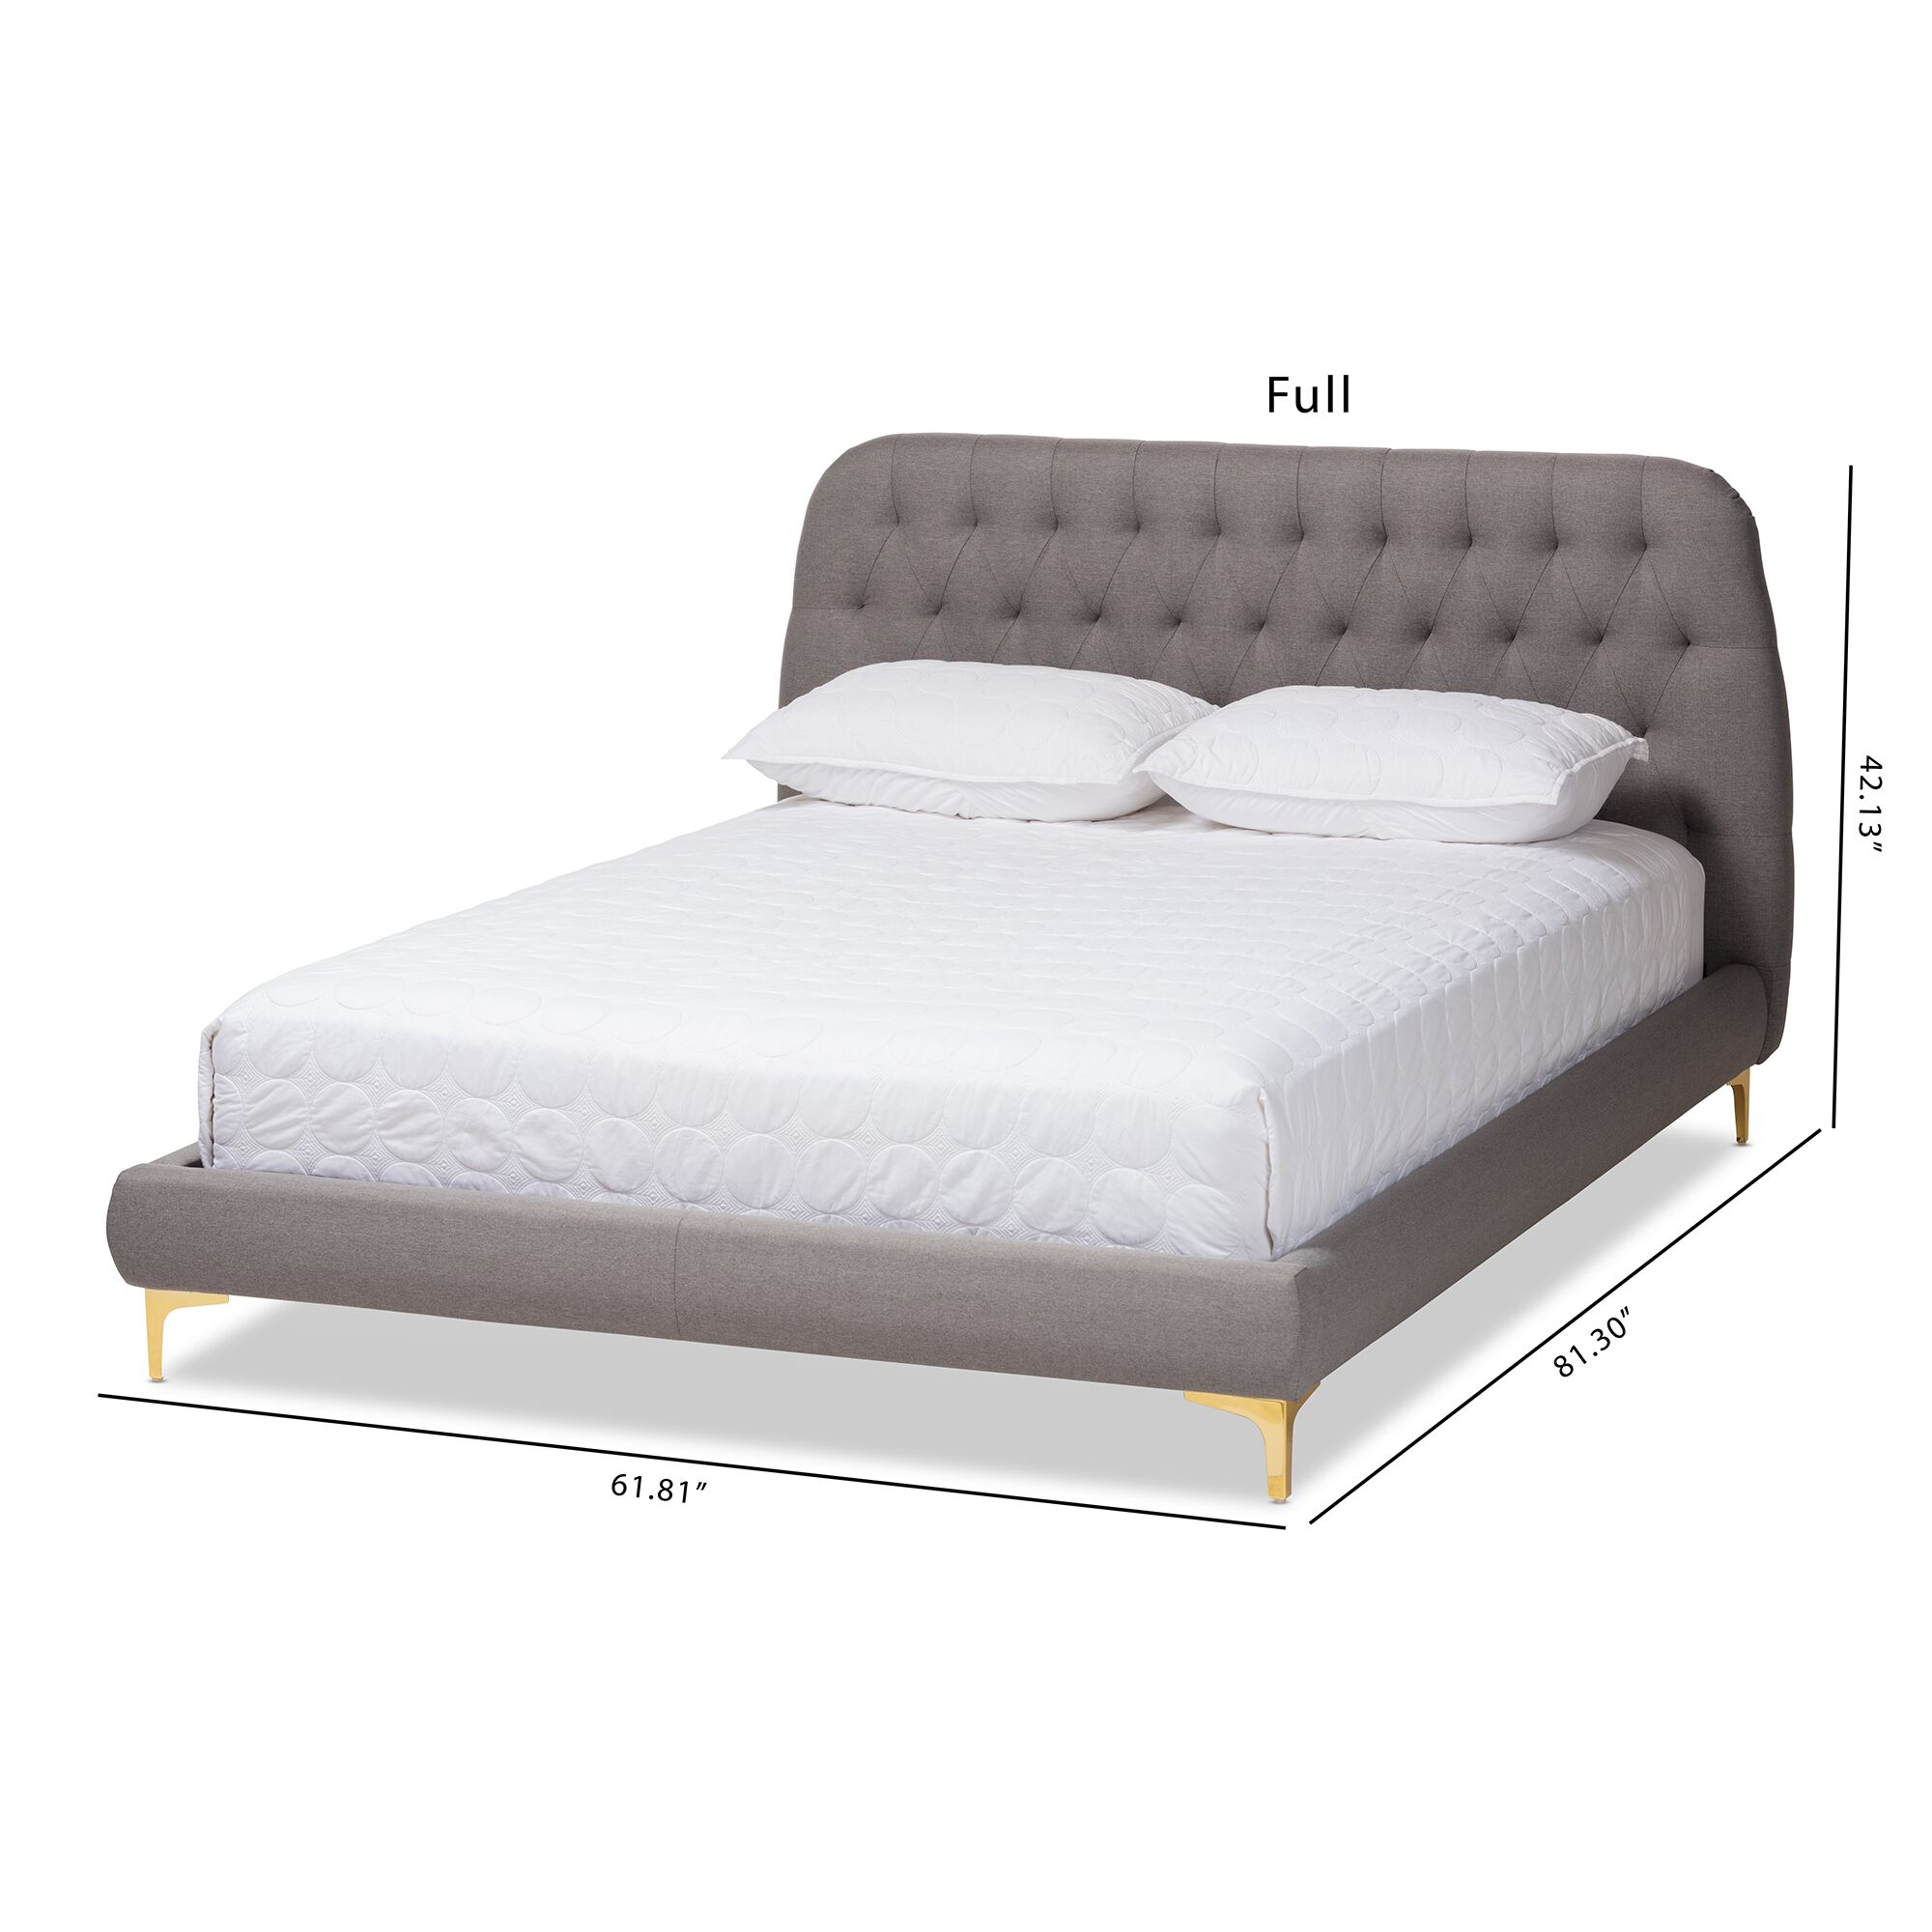 Commer Upholstered Platform Bed Size: Full, Color: Light Gray